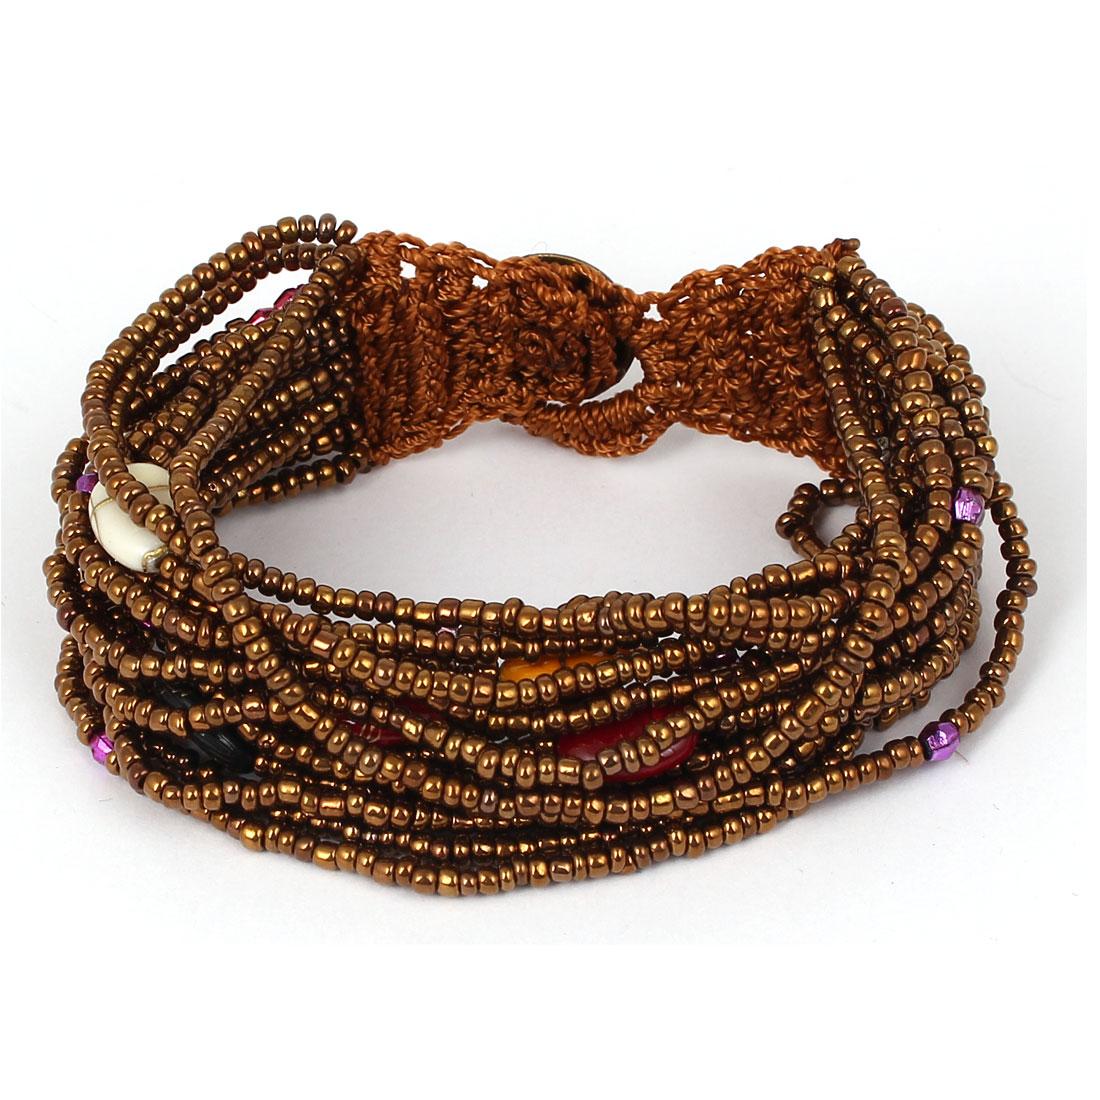 Women Button Closure Bead Chain Multilayer String Bangle Cuff Bracelet Brown